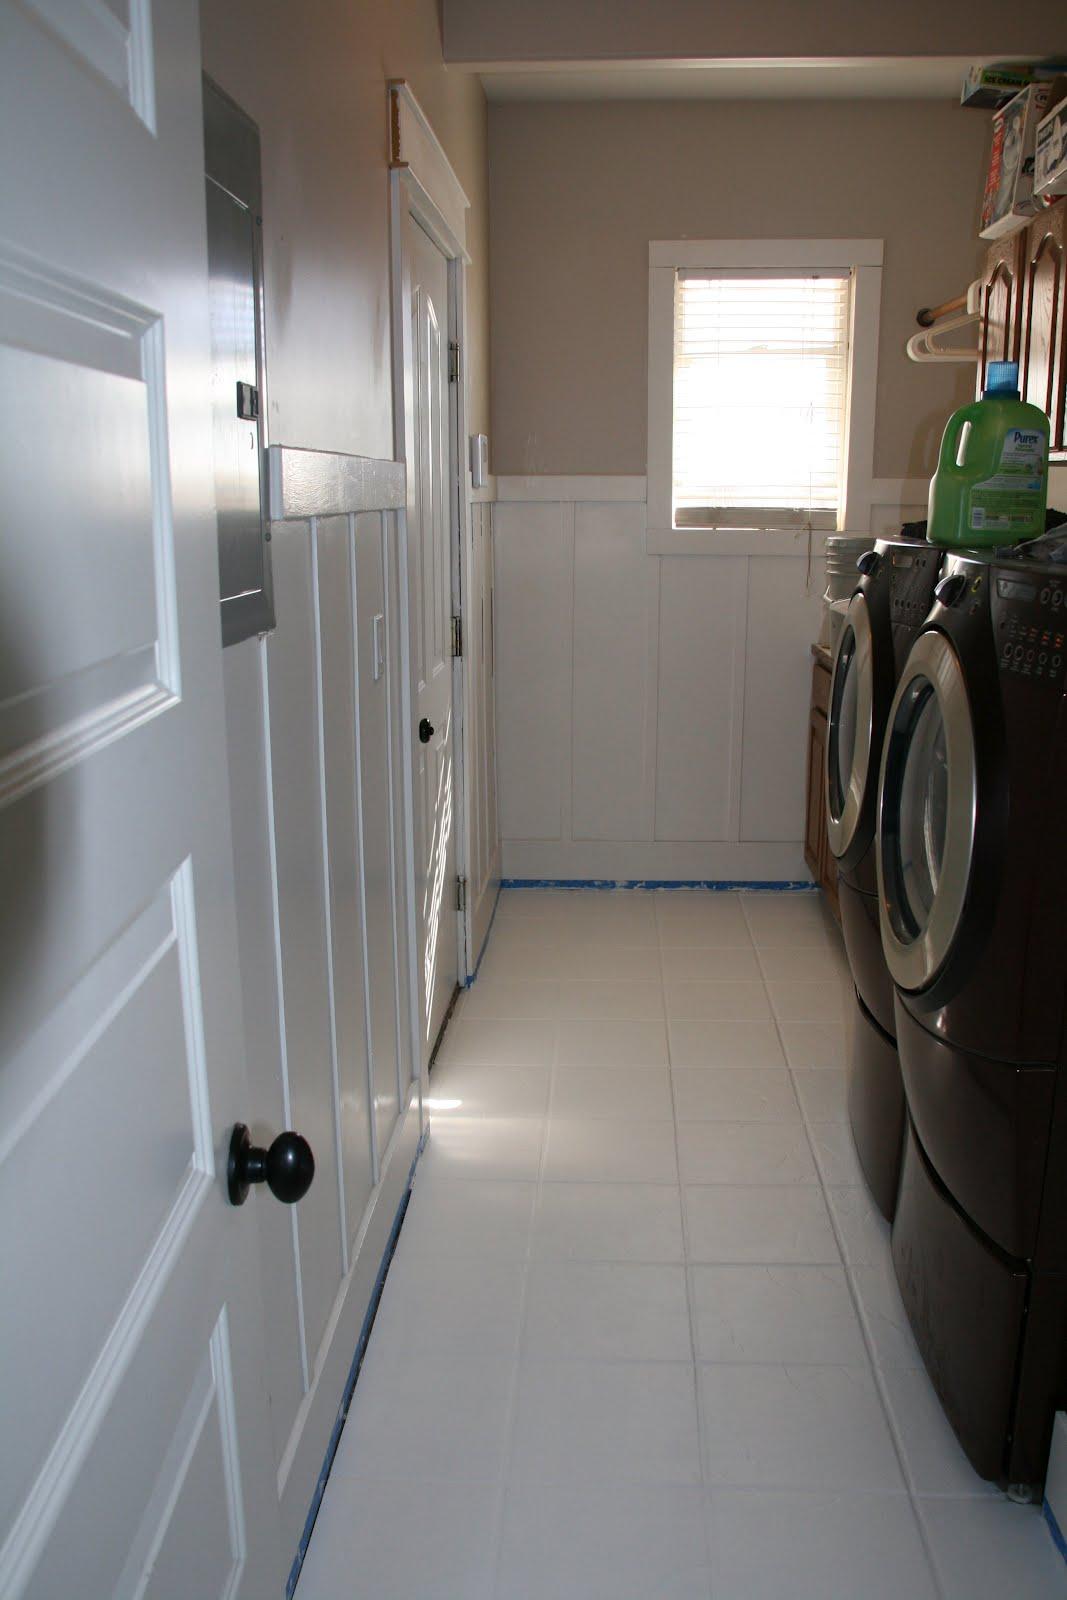 retropolitan painted floors a tutorial. Black Bedroom Furniture Sets. Home Design Ideas